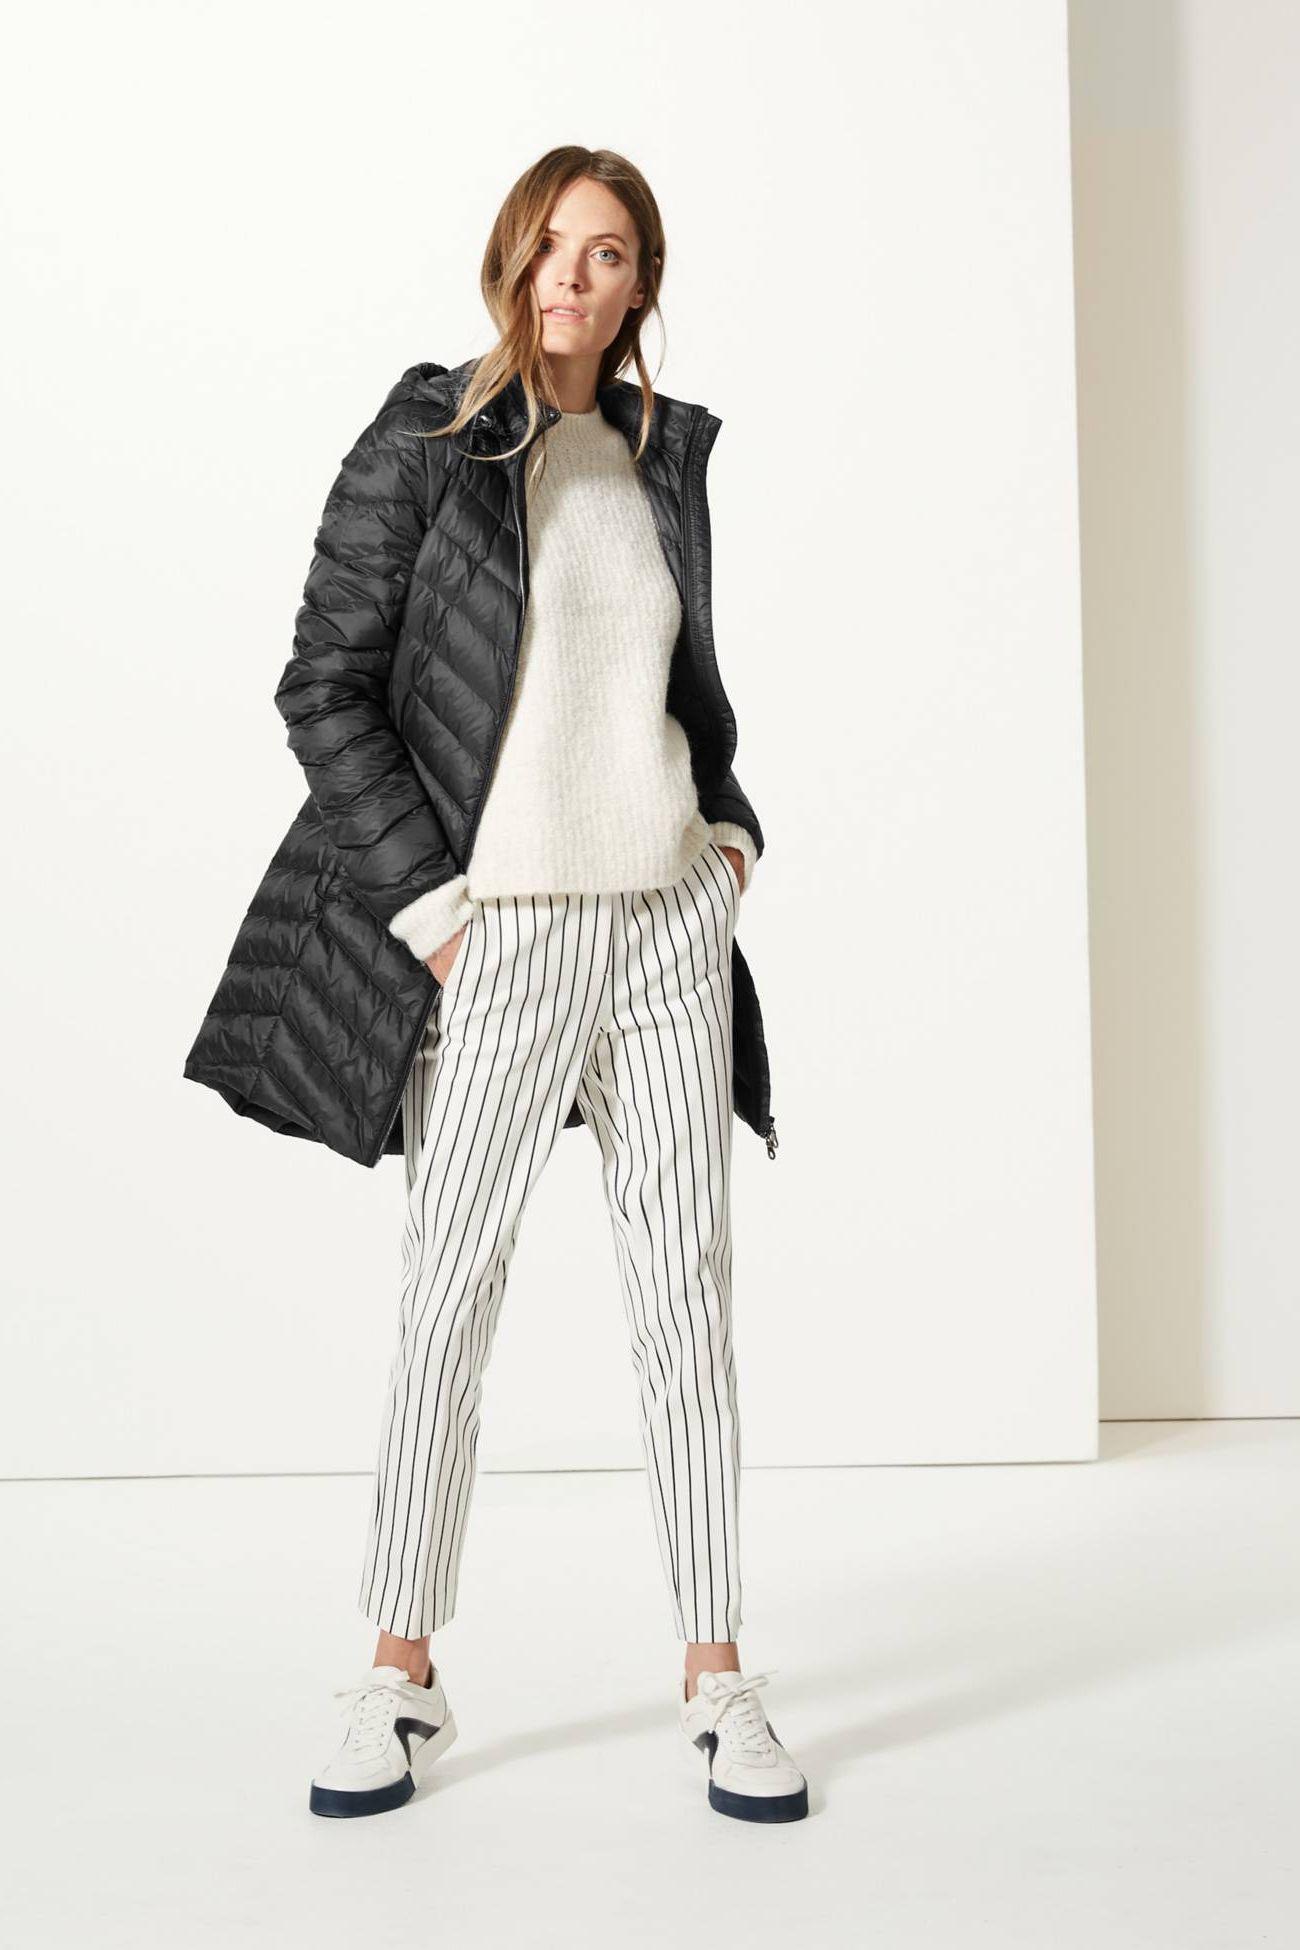 Marks & Spencer winter coats